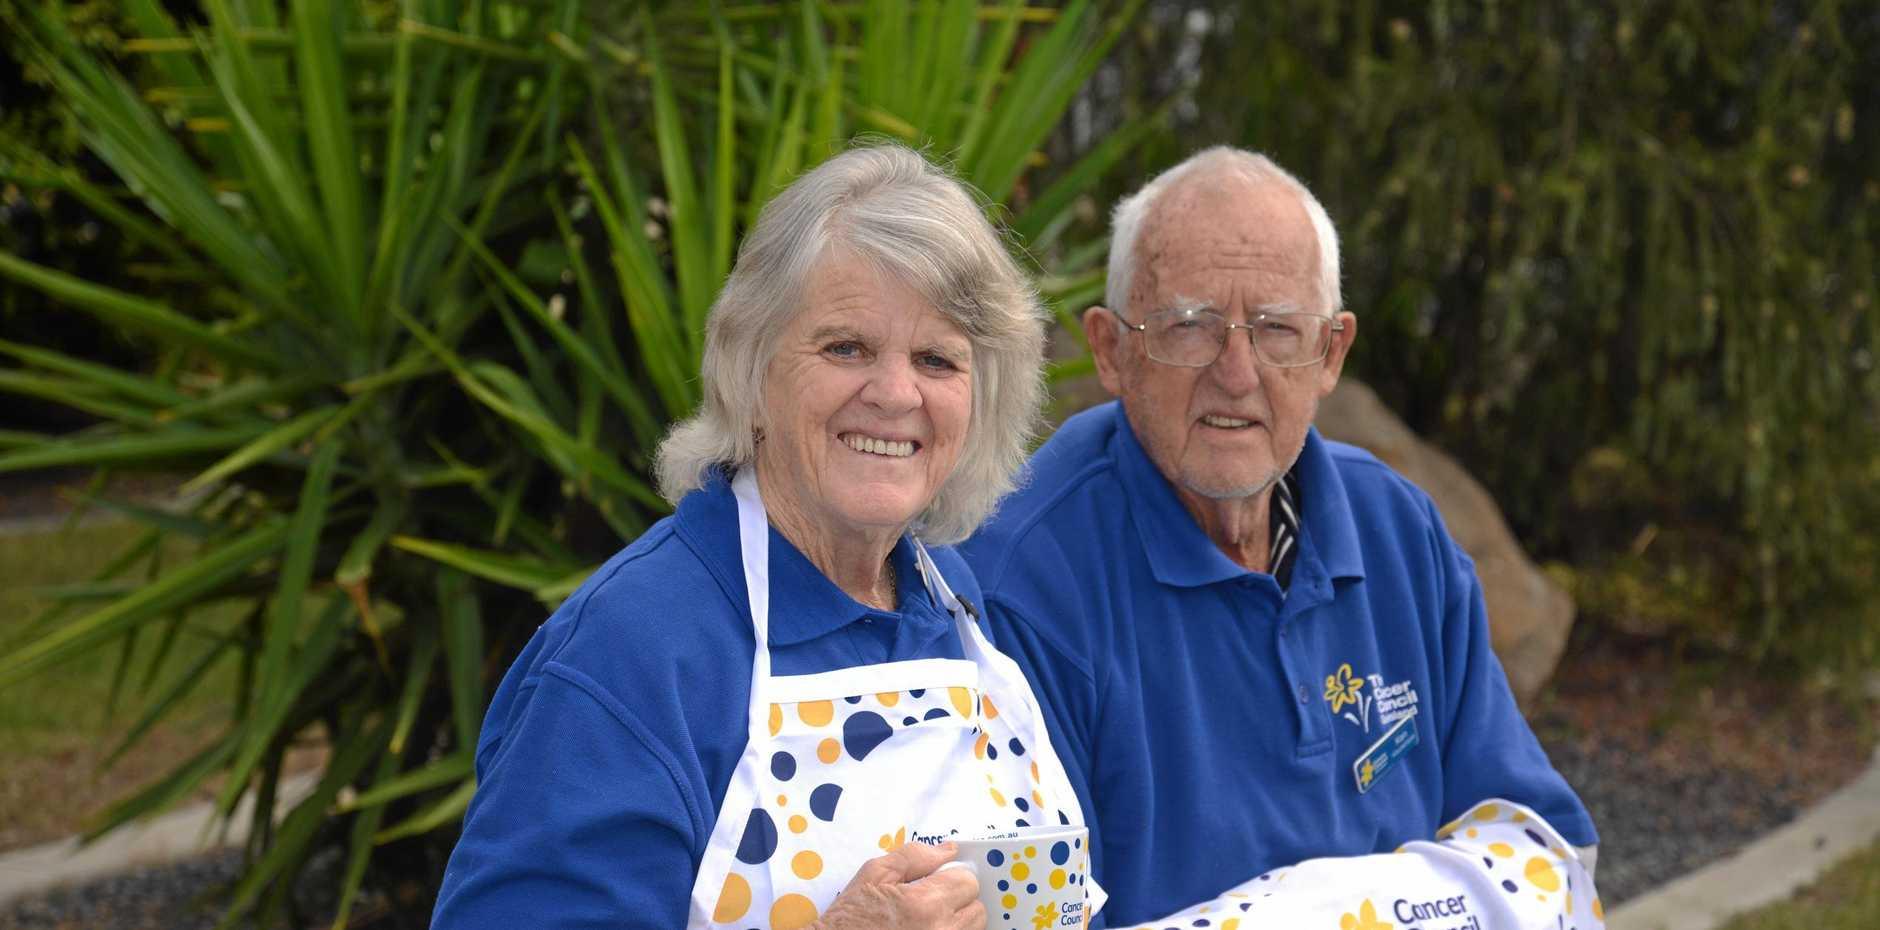 HELPING HANDS: Kay Wilson and Ken Hartnett are ready for Thursday's Biggest Morning Tea fundraiser at the Senior Citizens Centre.